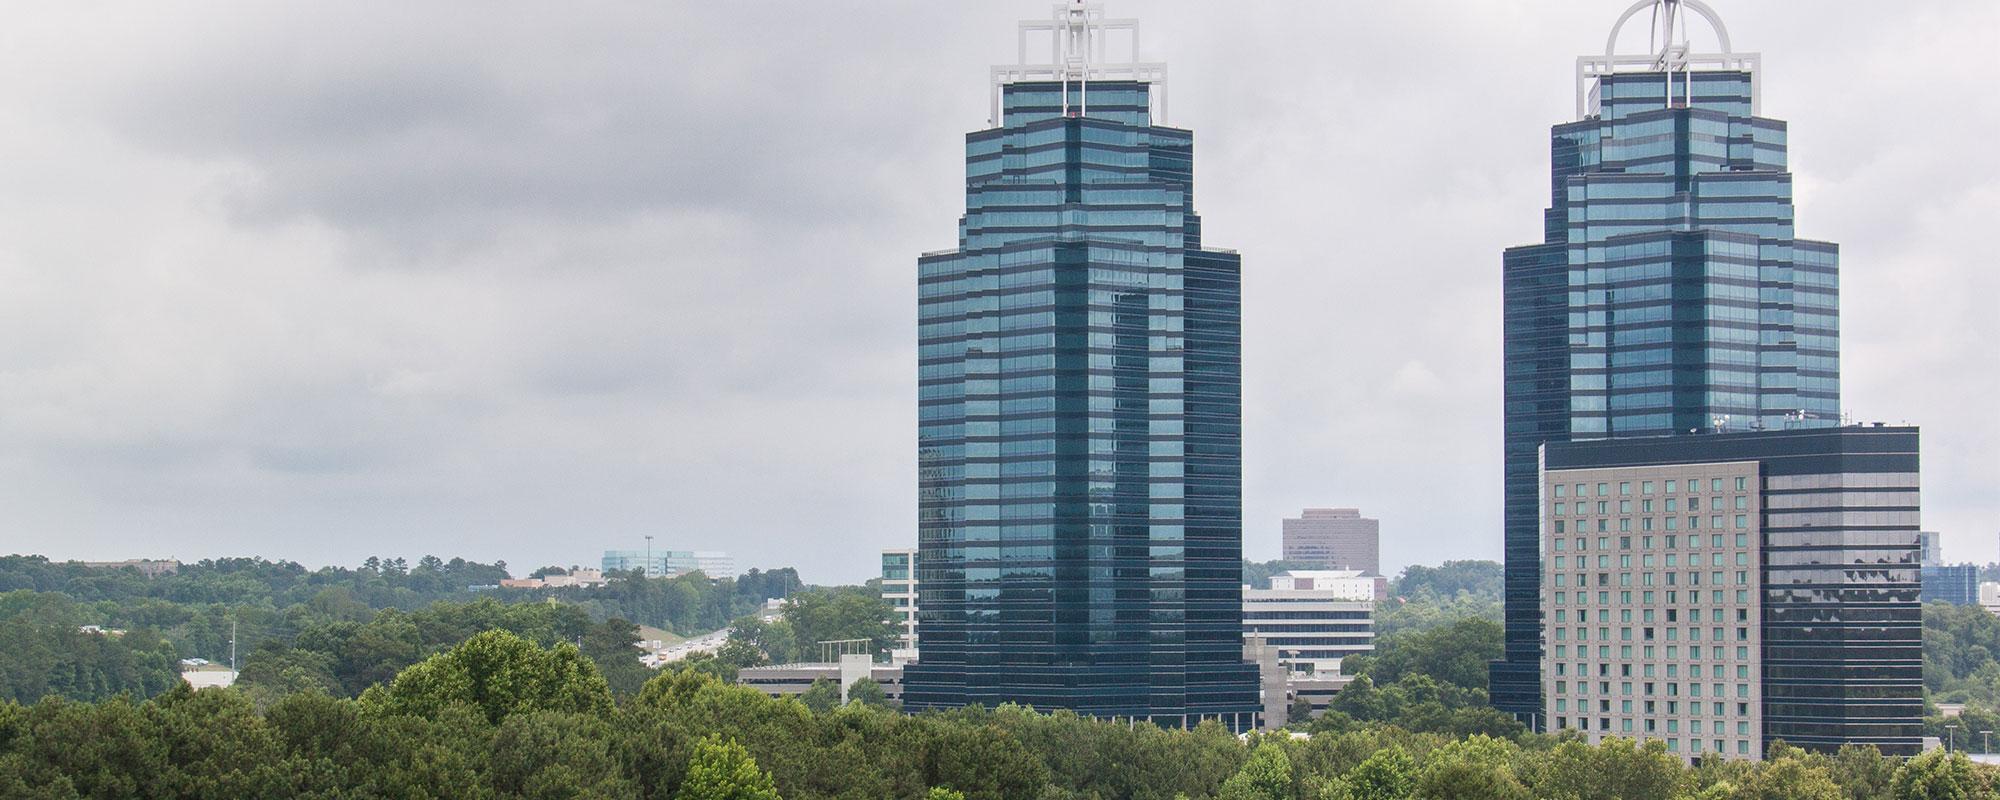 Atlanta Perimeter North 1148249511.jpg